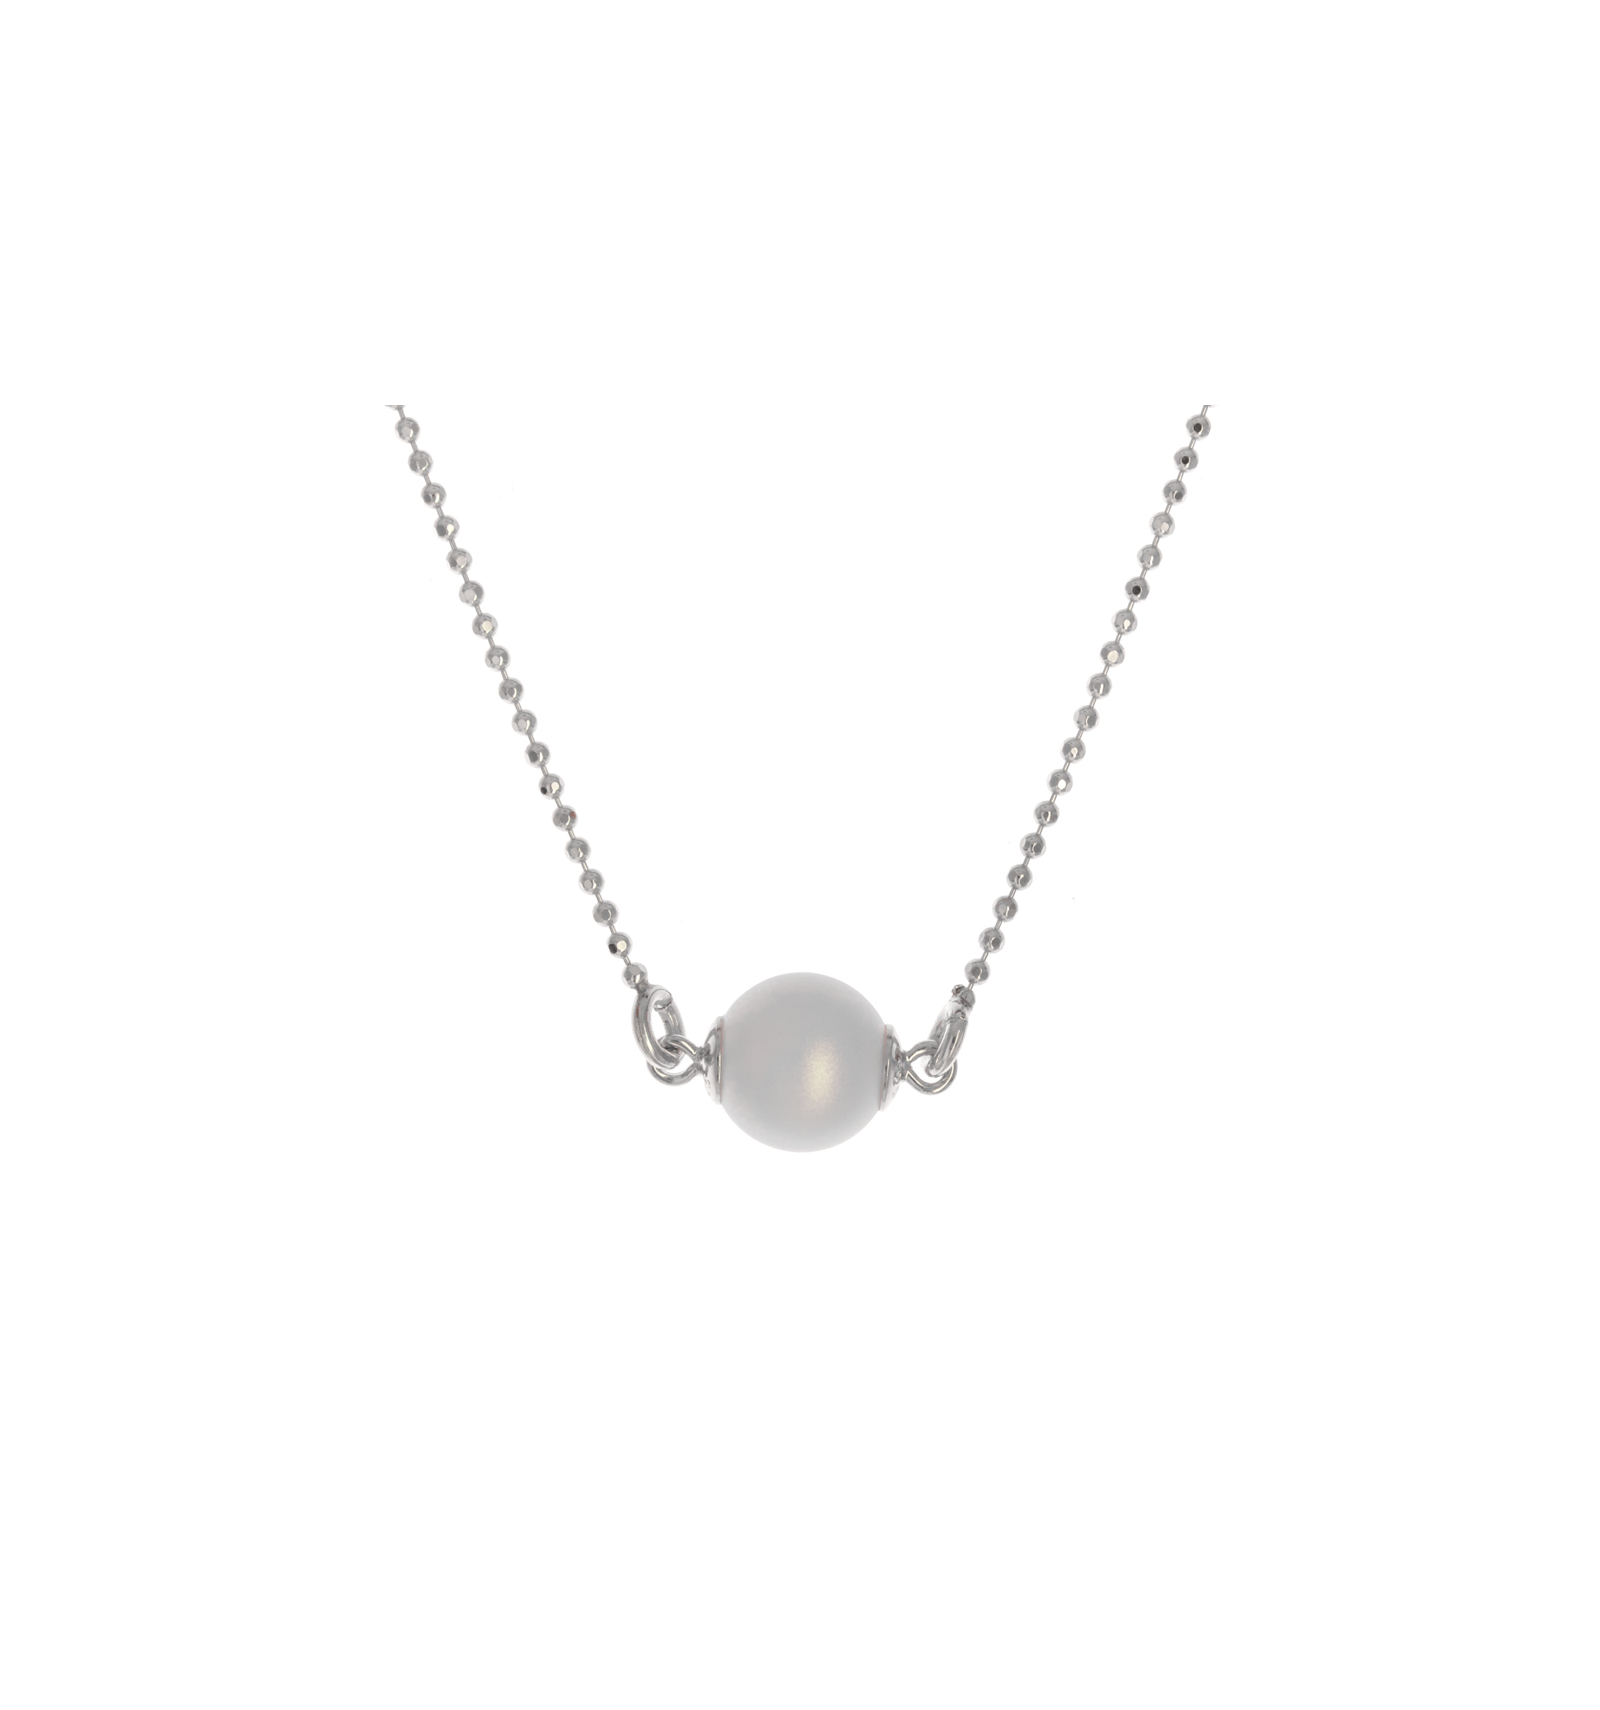 c3c3dc14c Strieborný náhrdelník perlový so Swarovski elements perla 44cm